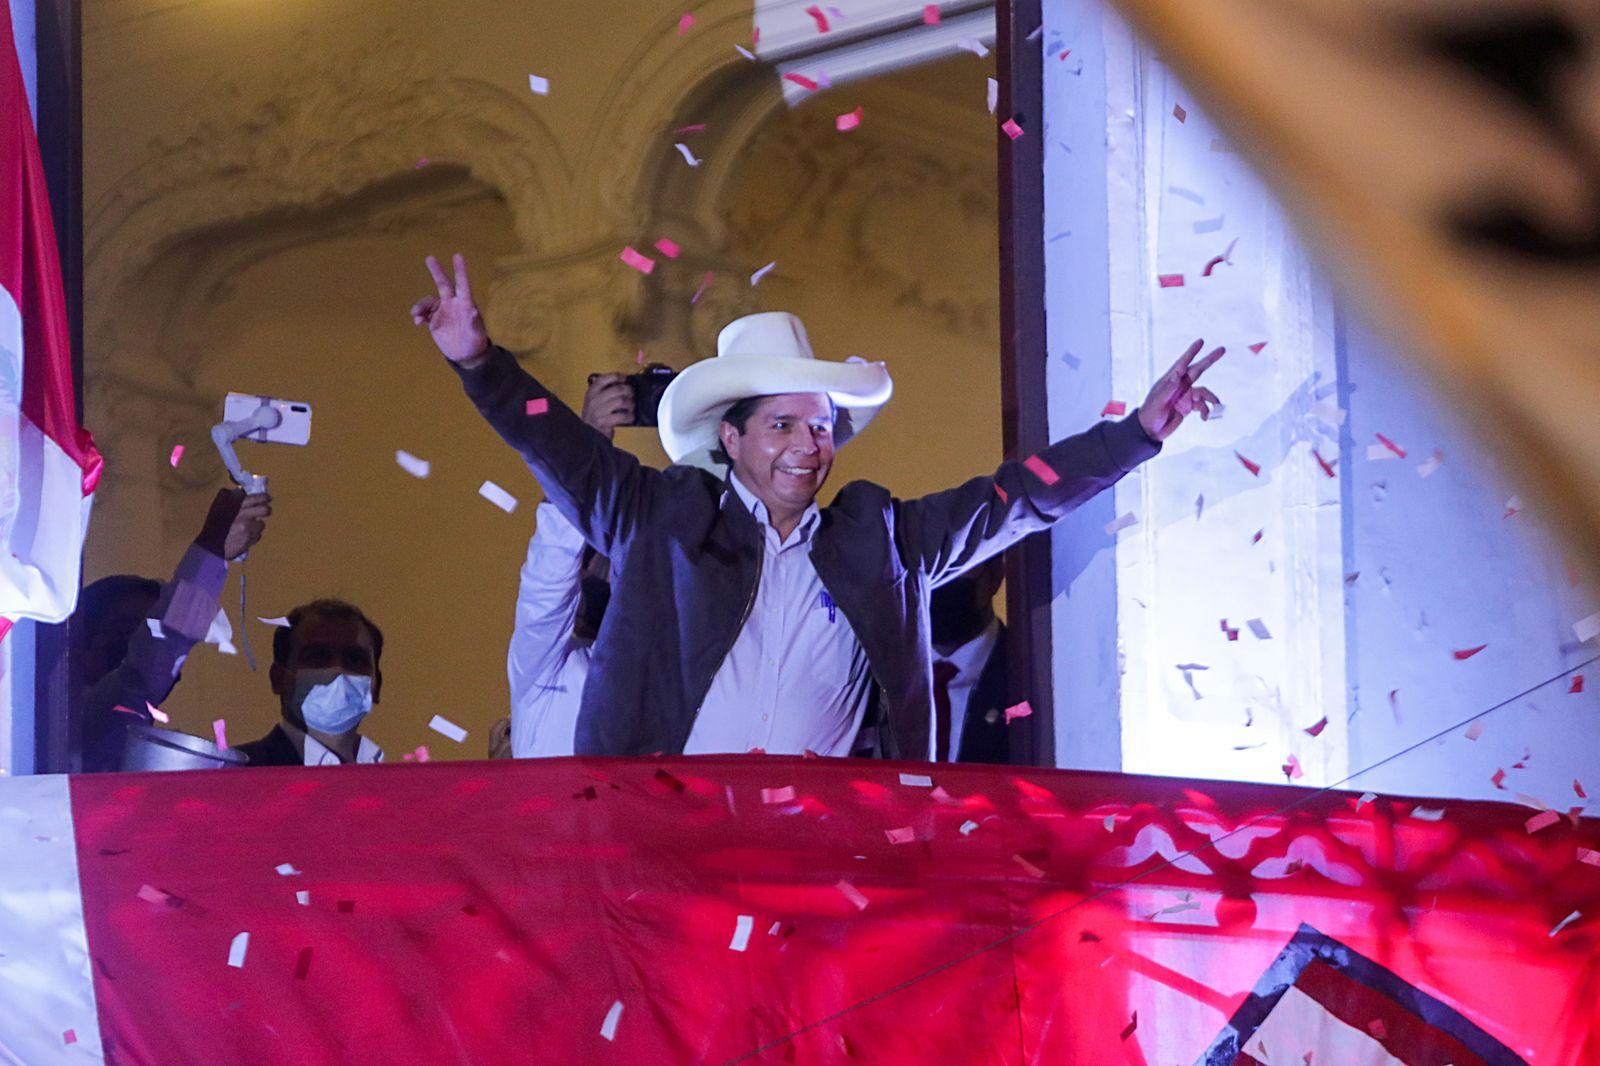 Peru's presidential candidate Pedro Castillo addresses supporters in Lima